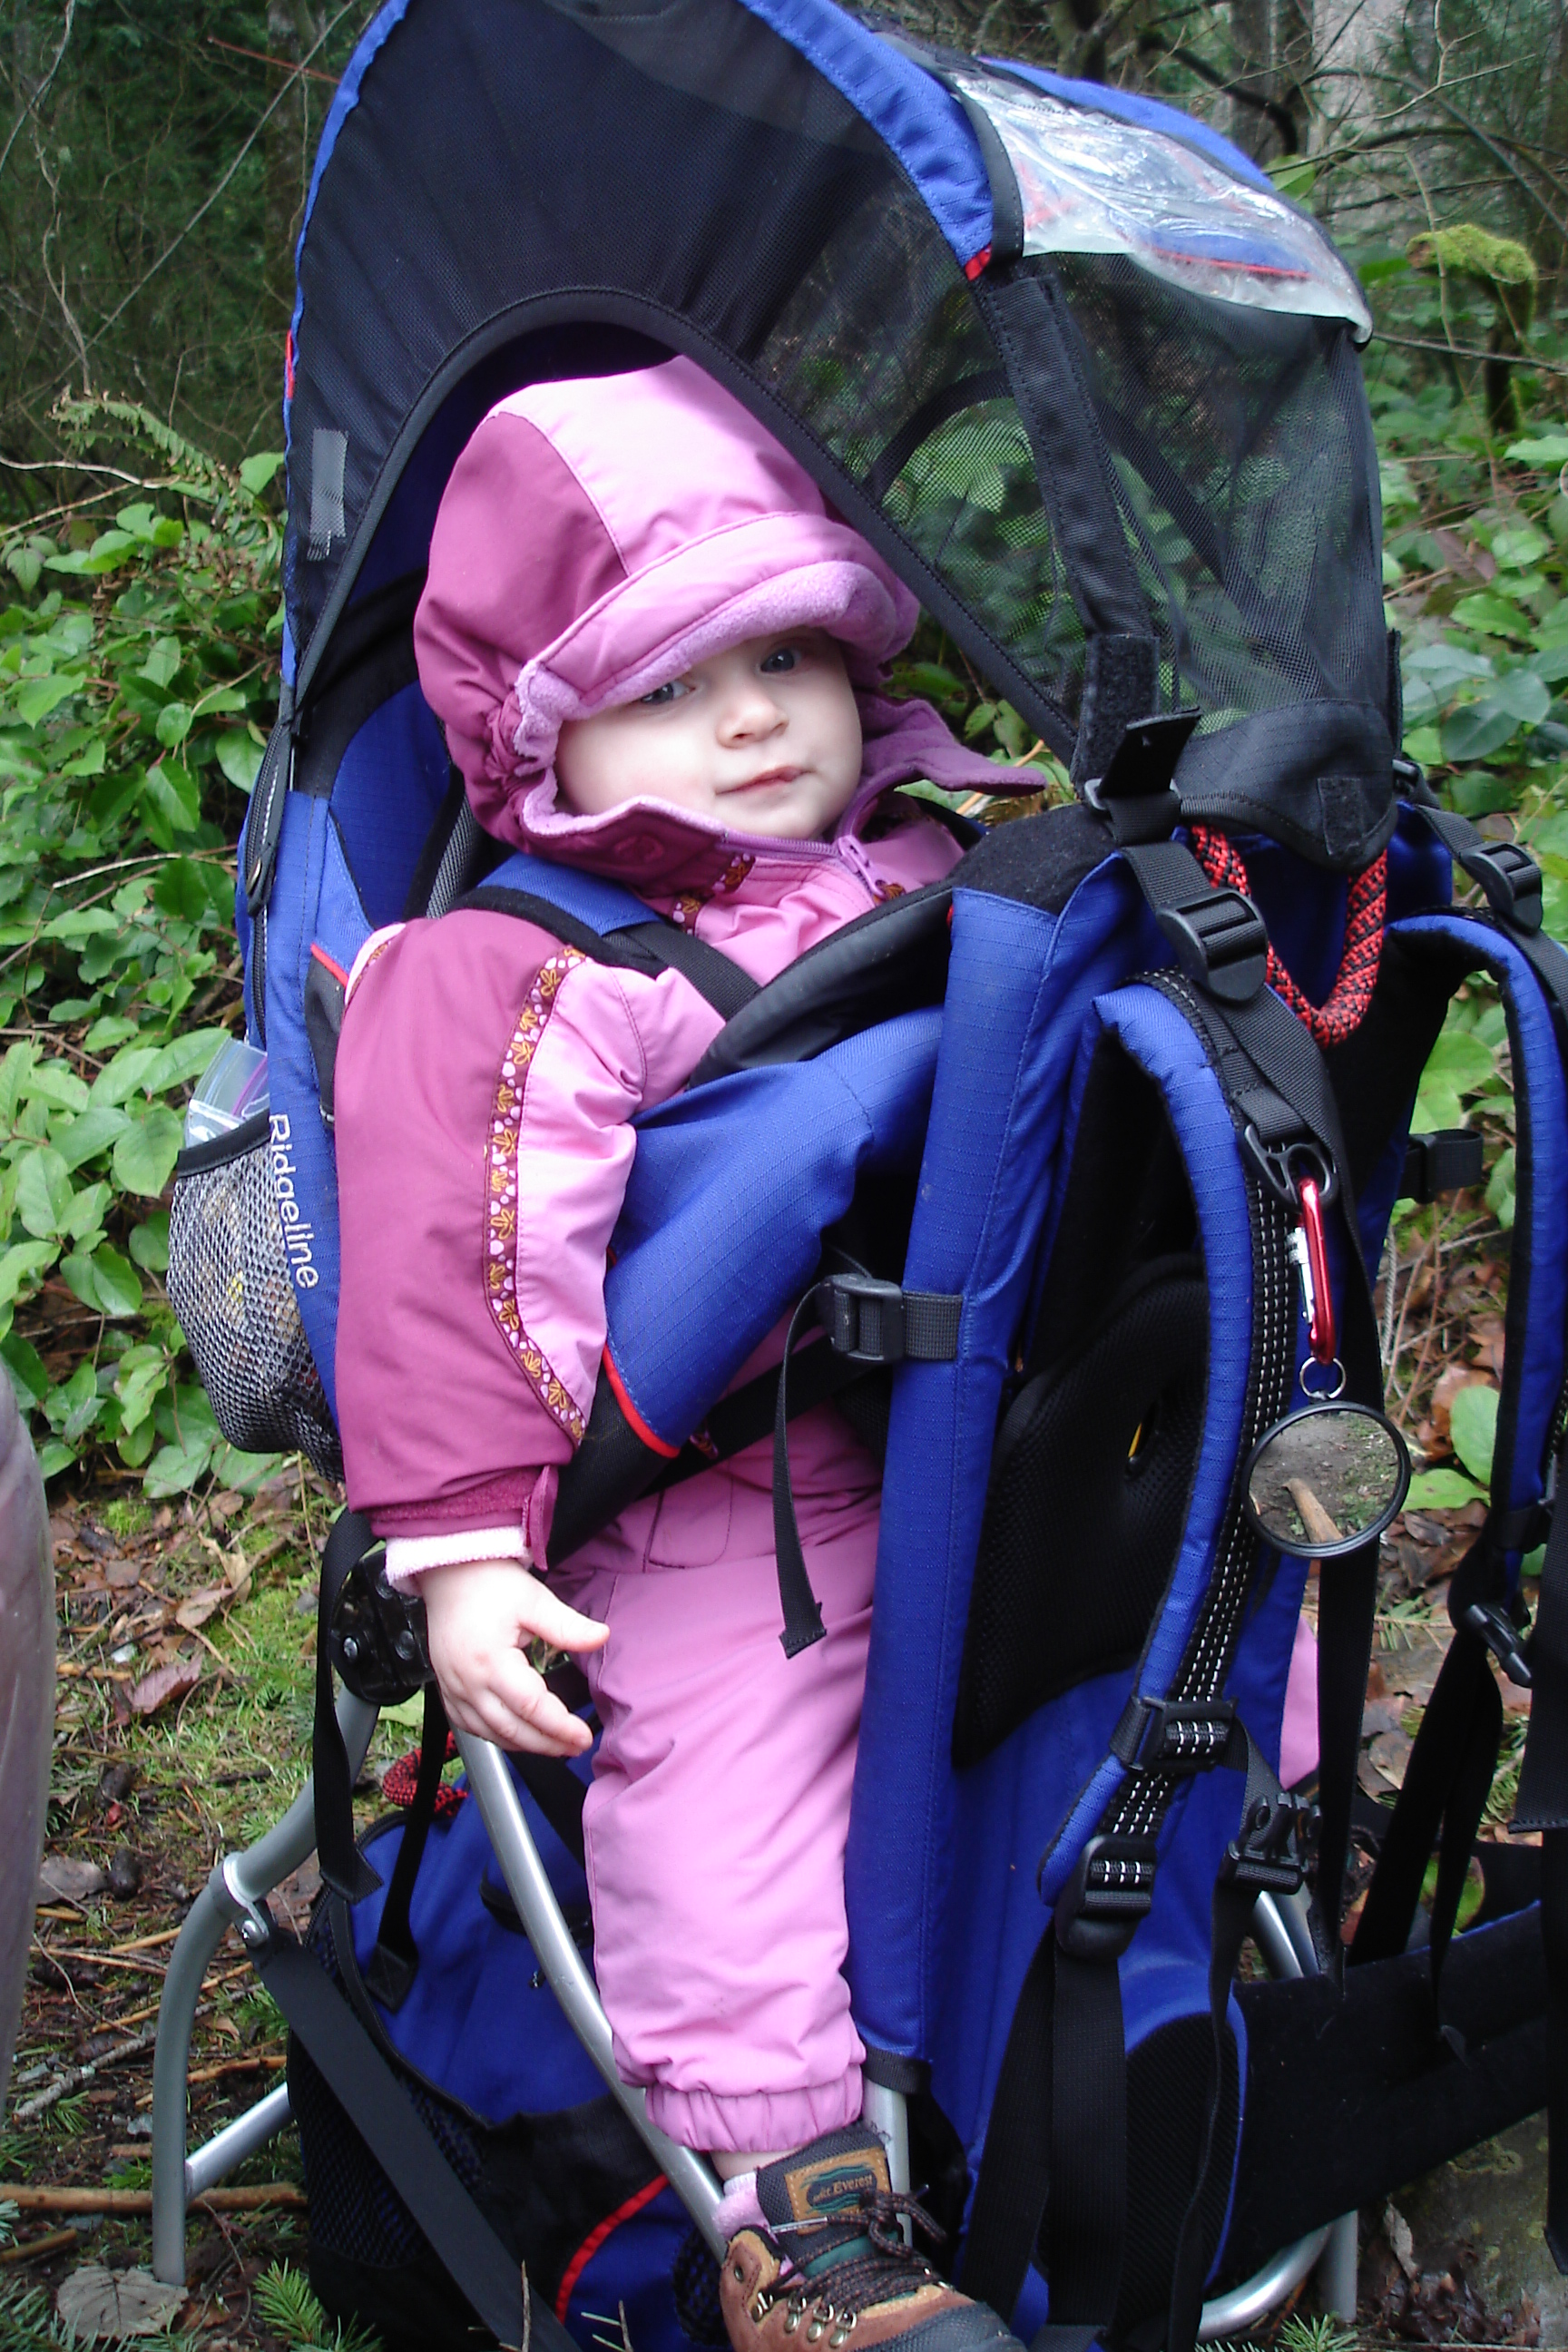 Childrens Hiking Backpack - Top Reviewed Backpacks